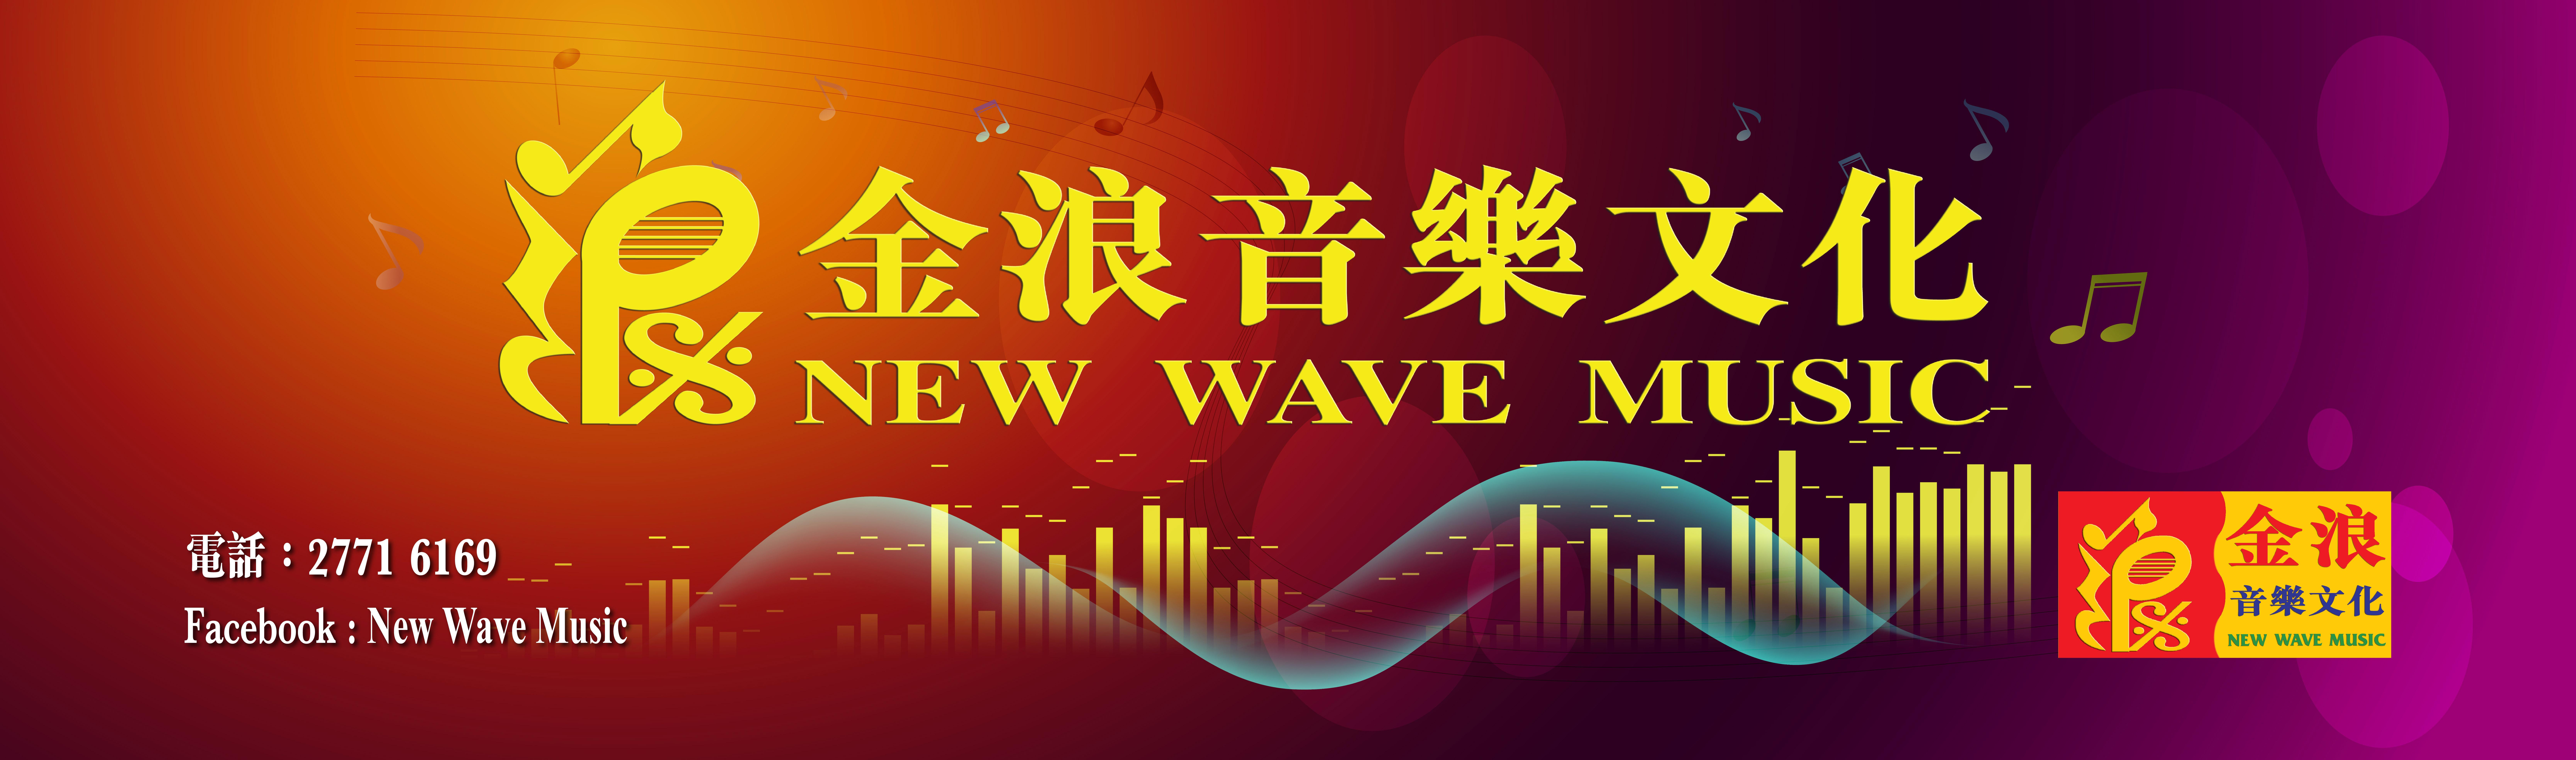 New wave (musica) - Wikipedia